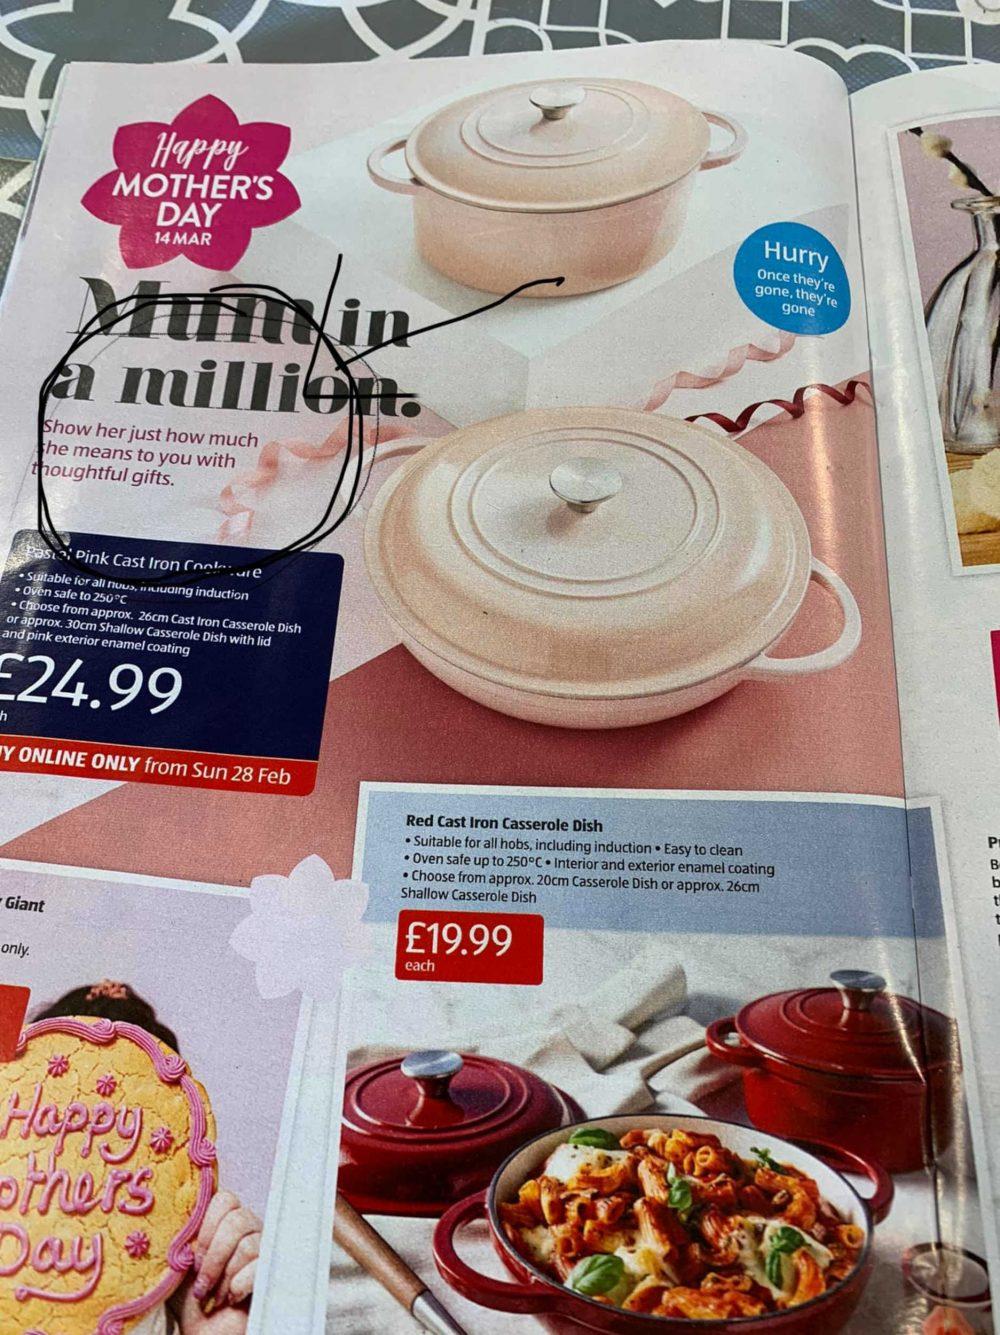 Aldi's Mother's day advert | Retail News UK